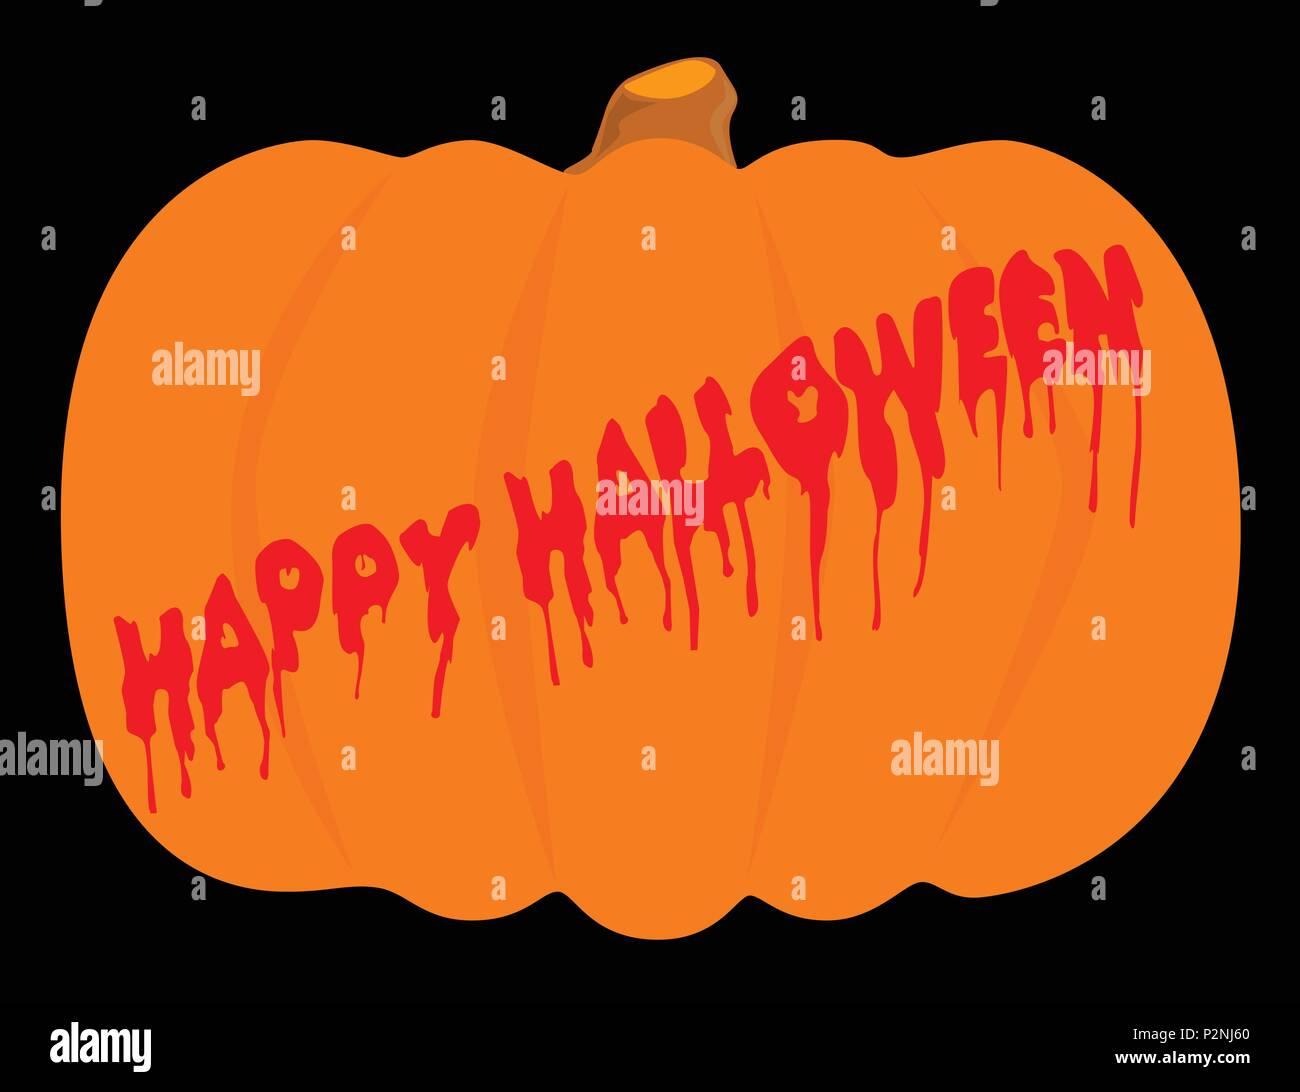 evil halloween pumpkin with blood running halloween message stock